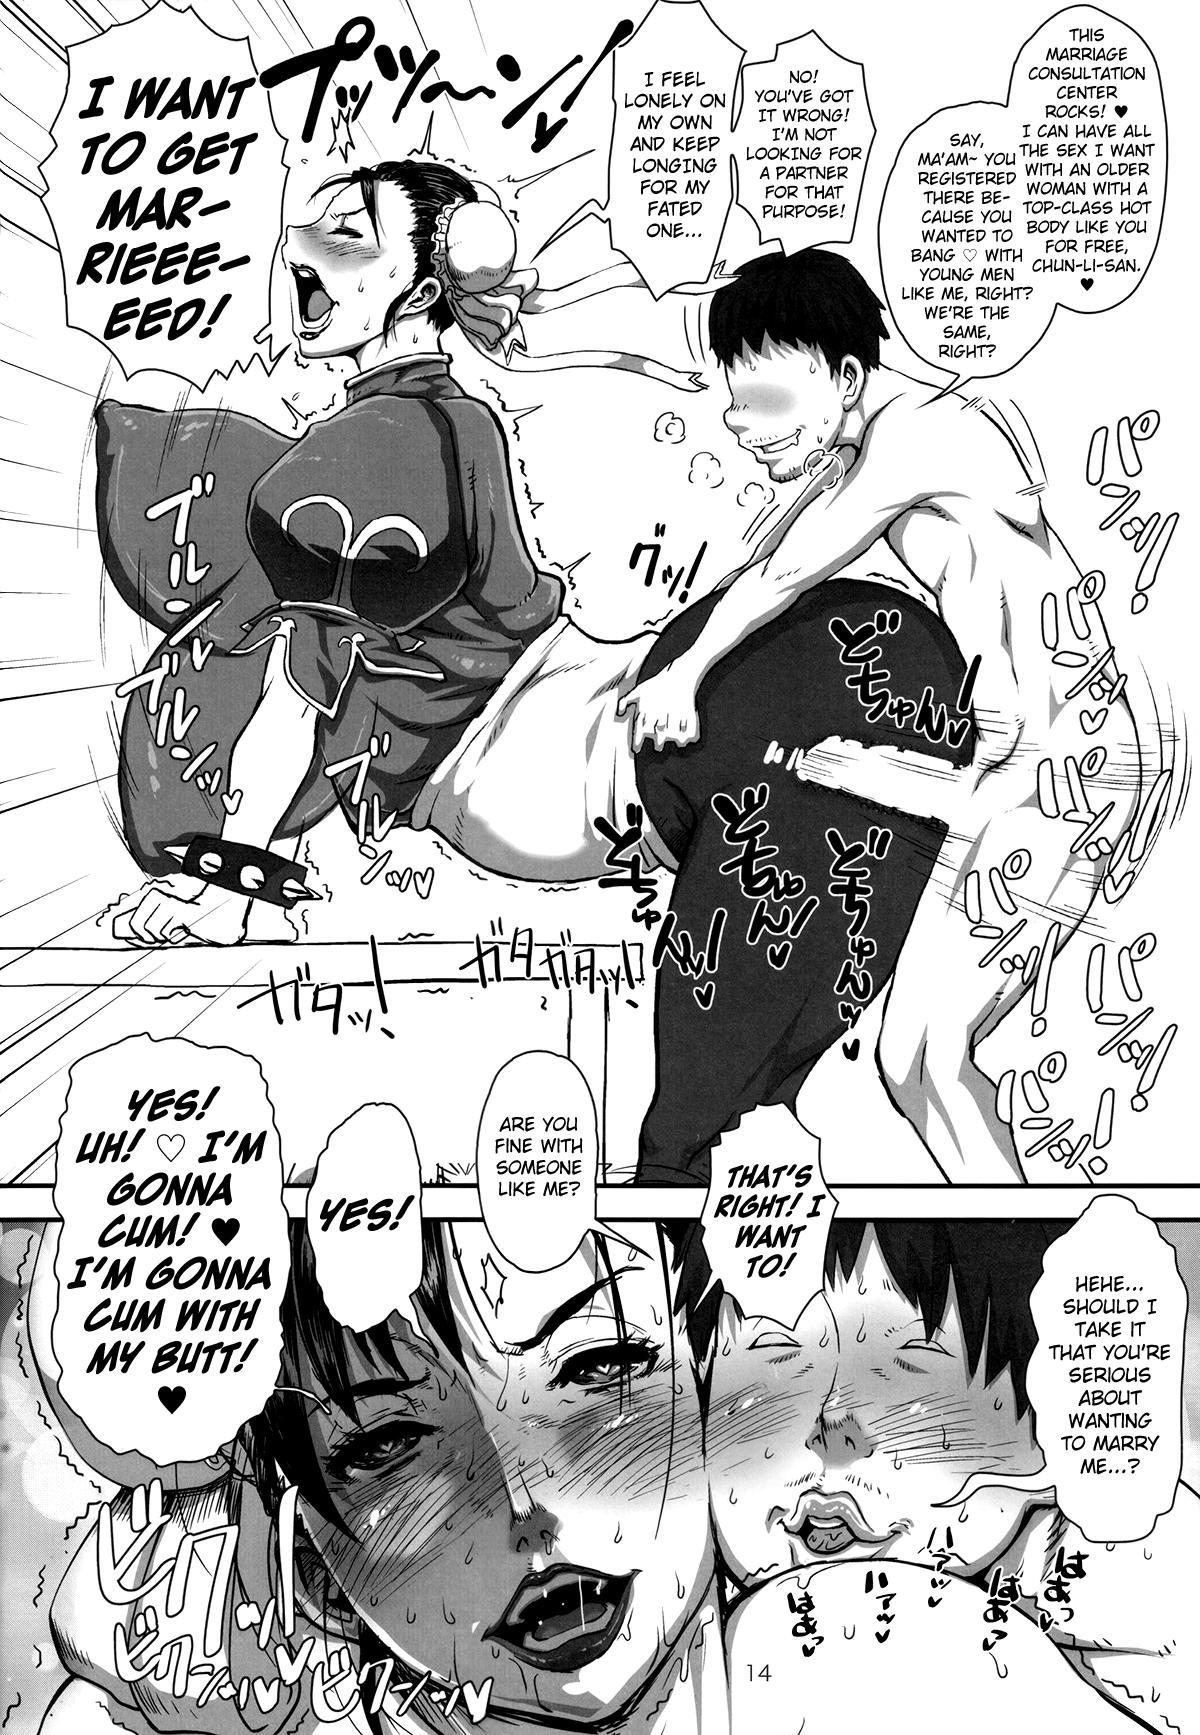 (C87) [8graphica (Yoshitama Ichirou, Nanakichi)] METABOLISM Chun-Li A Beautiful and Mature Chun-Li-san has Serious Sex with the Candidates while Looking For a Marriage Partner. (Street Fighter) [English] [biribiri] 12